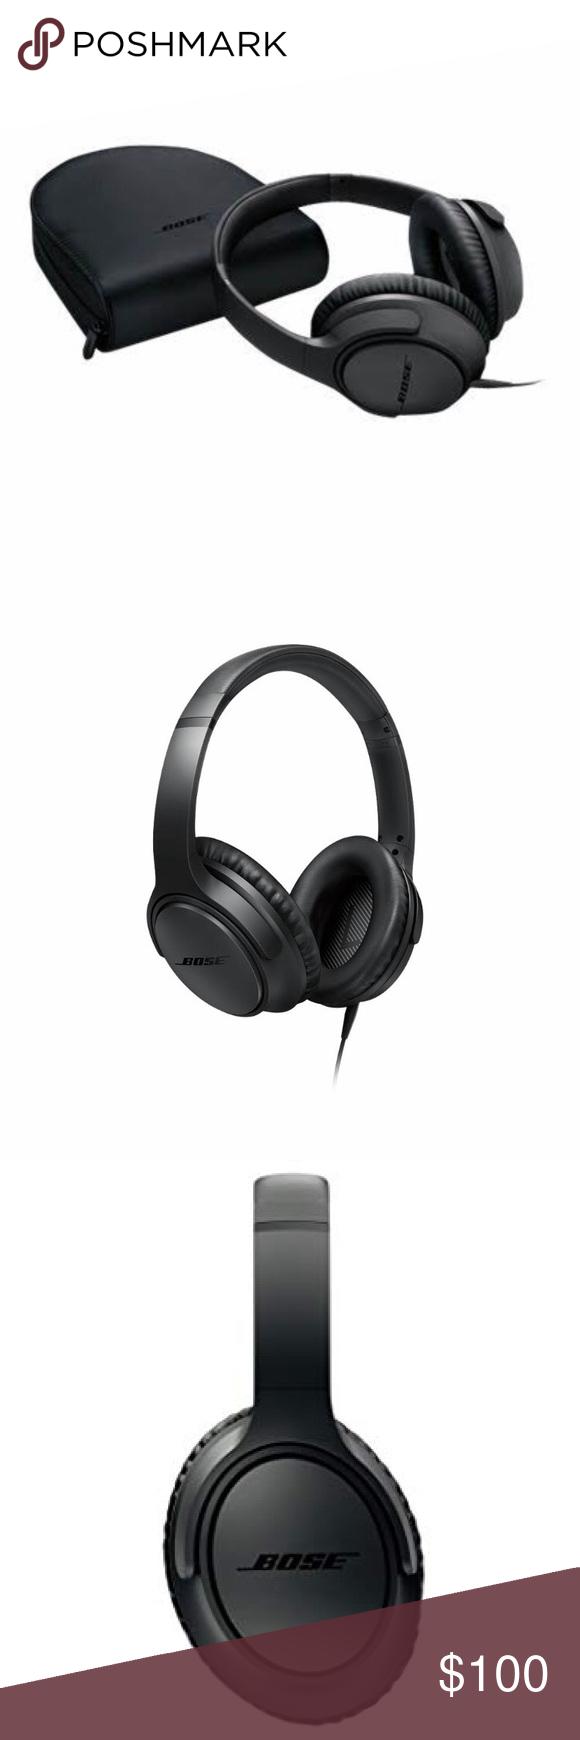 Bose Headphones Bose Soundtrue Around Ear Headphones Ii Apple Devices Charcoal Used But In Very Good Condition Bose Headphones Headphones In Ear Headphones